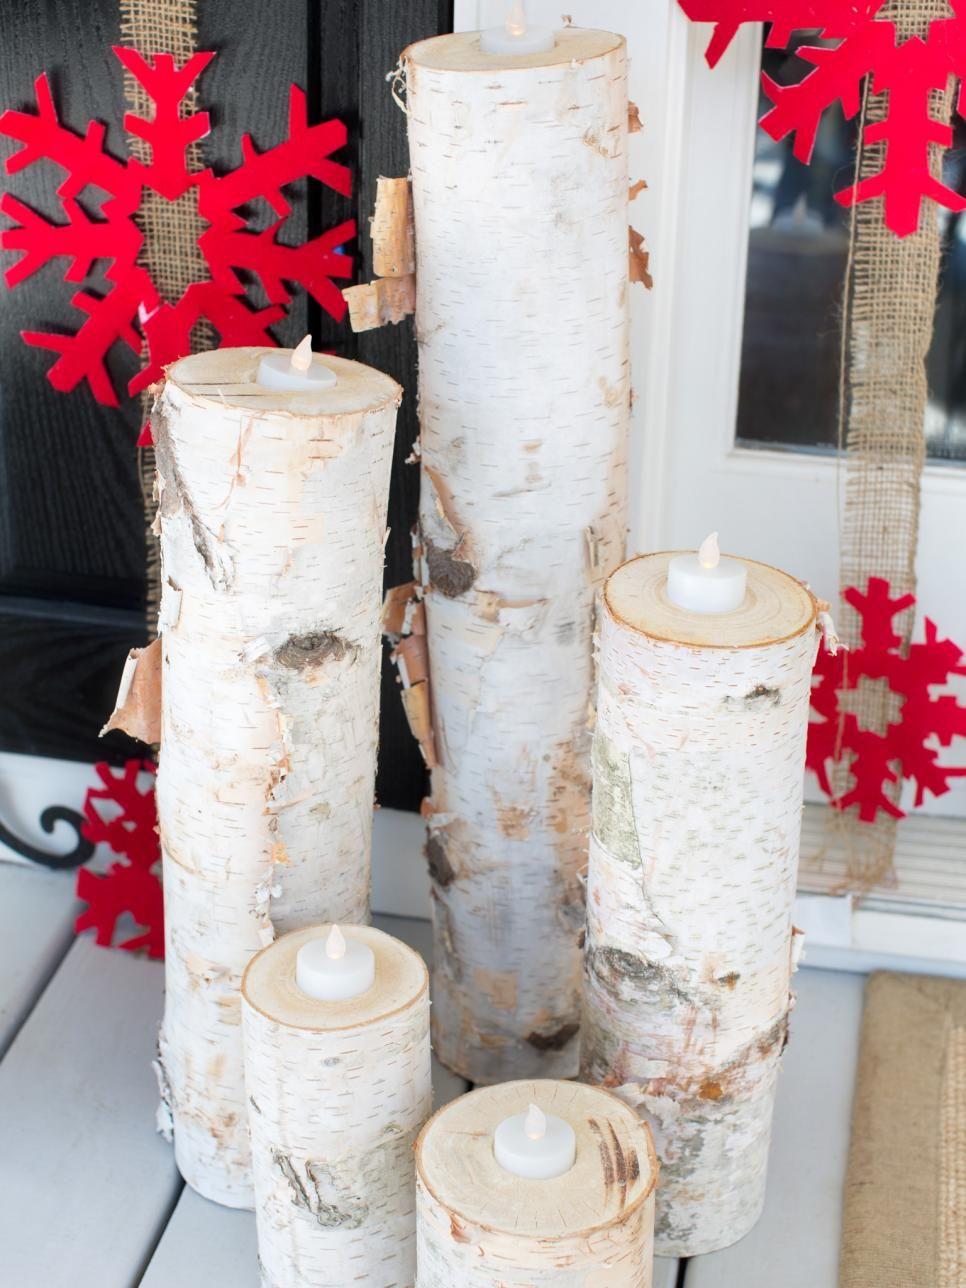 Yuletide Votive Logs - 50 Best Outdoor Christmas Decorations | http://homebnc.com/best-outdoor-christmas-decorations/ | #christmas #outdoor #outdoors #decoration #holidays #decor #homedecor #idea #creative #diy #beautiful #creative #ideas #homebnc